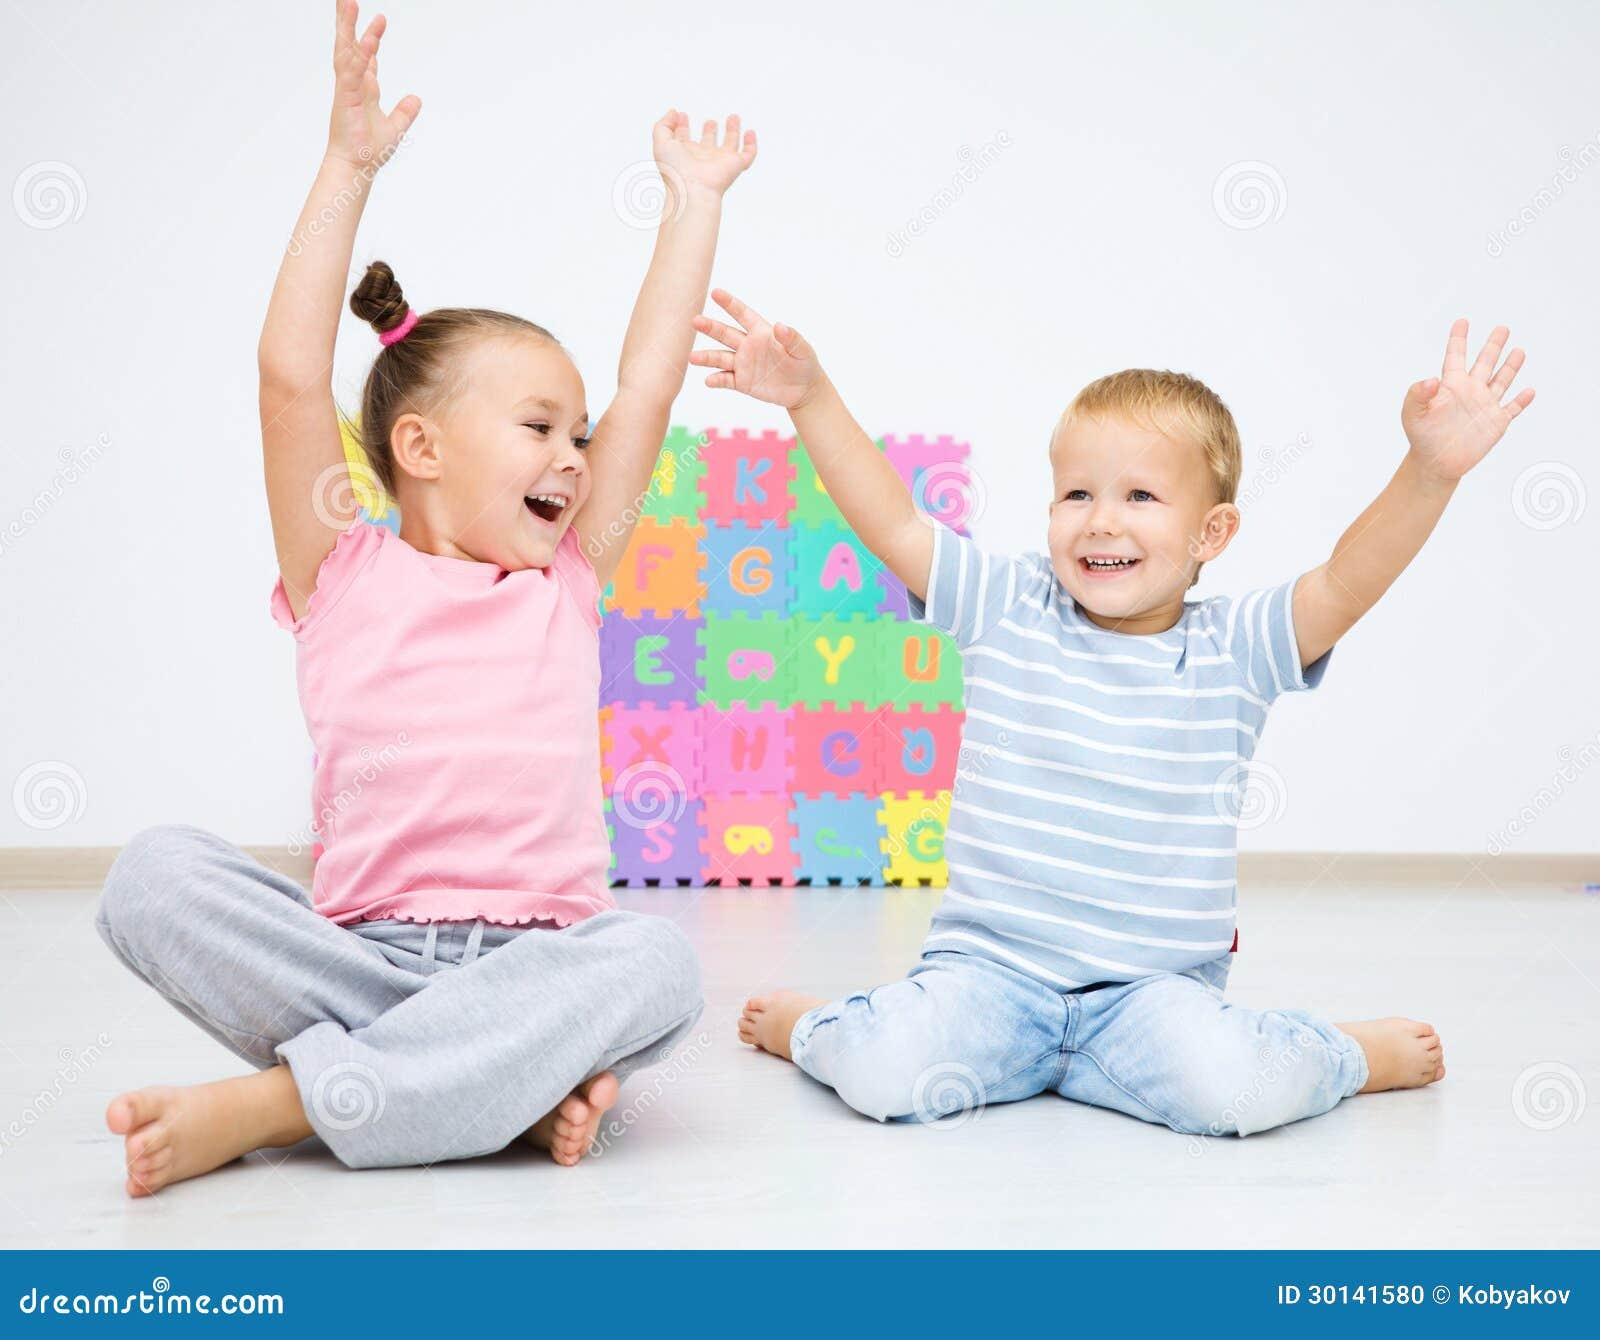 Childcare Floor Plans Children Are Sitting On Floor Stock Photo Image 30141580